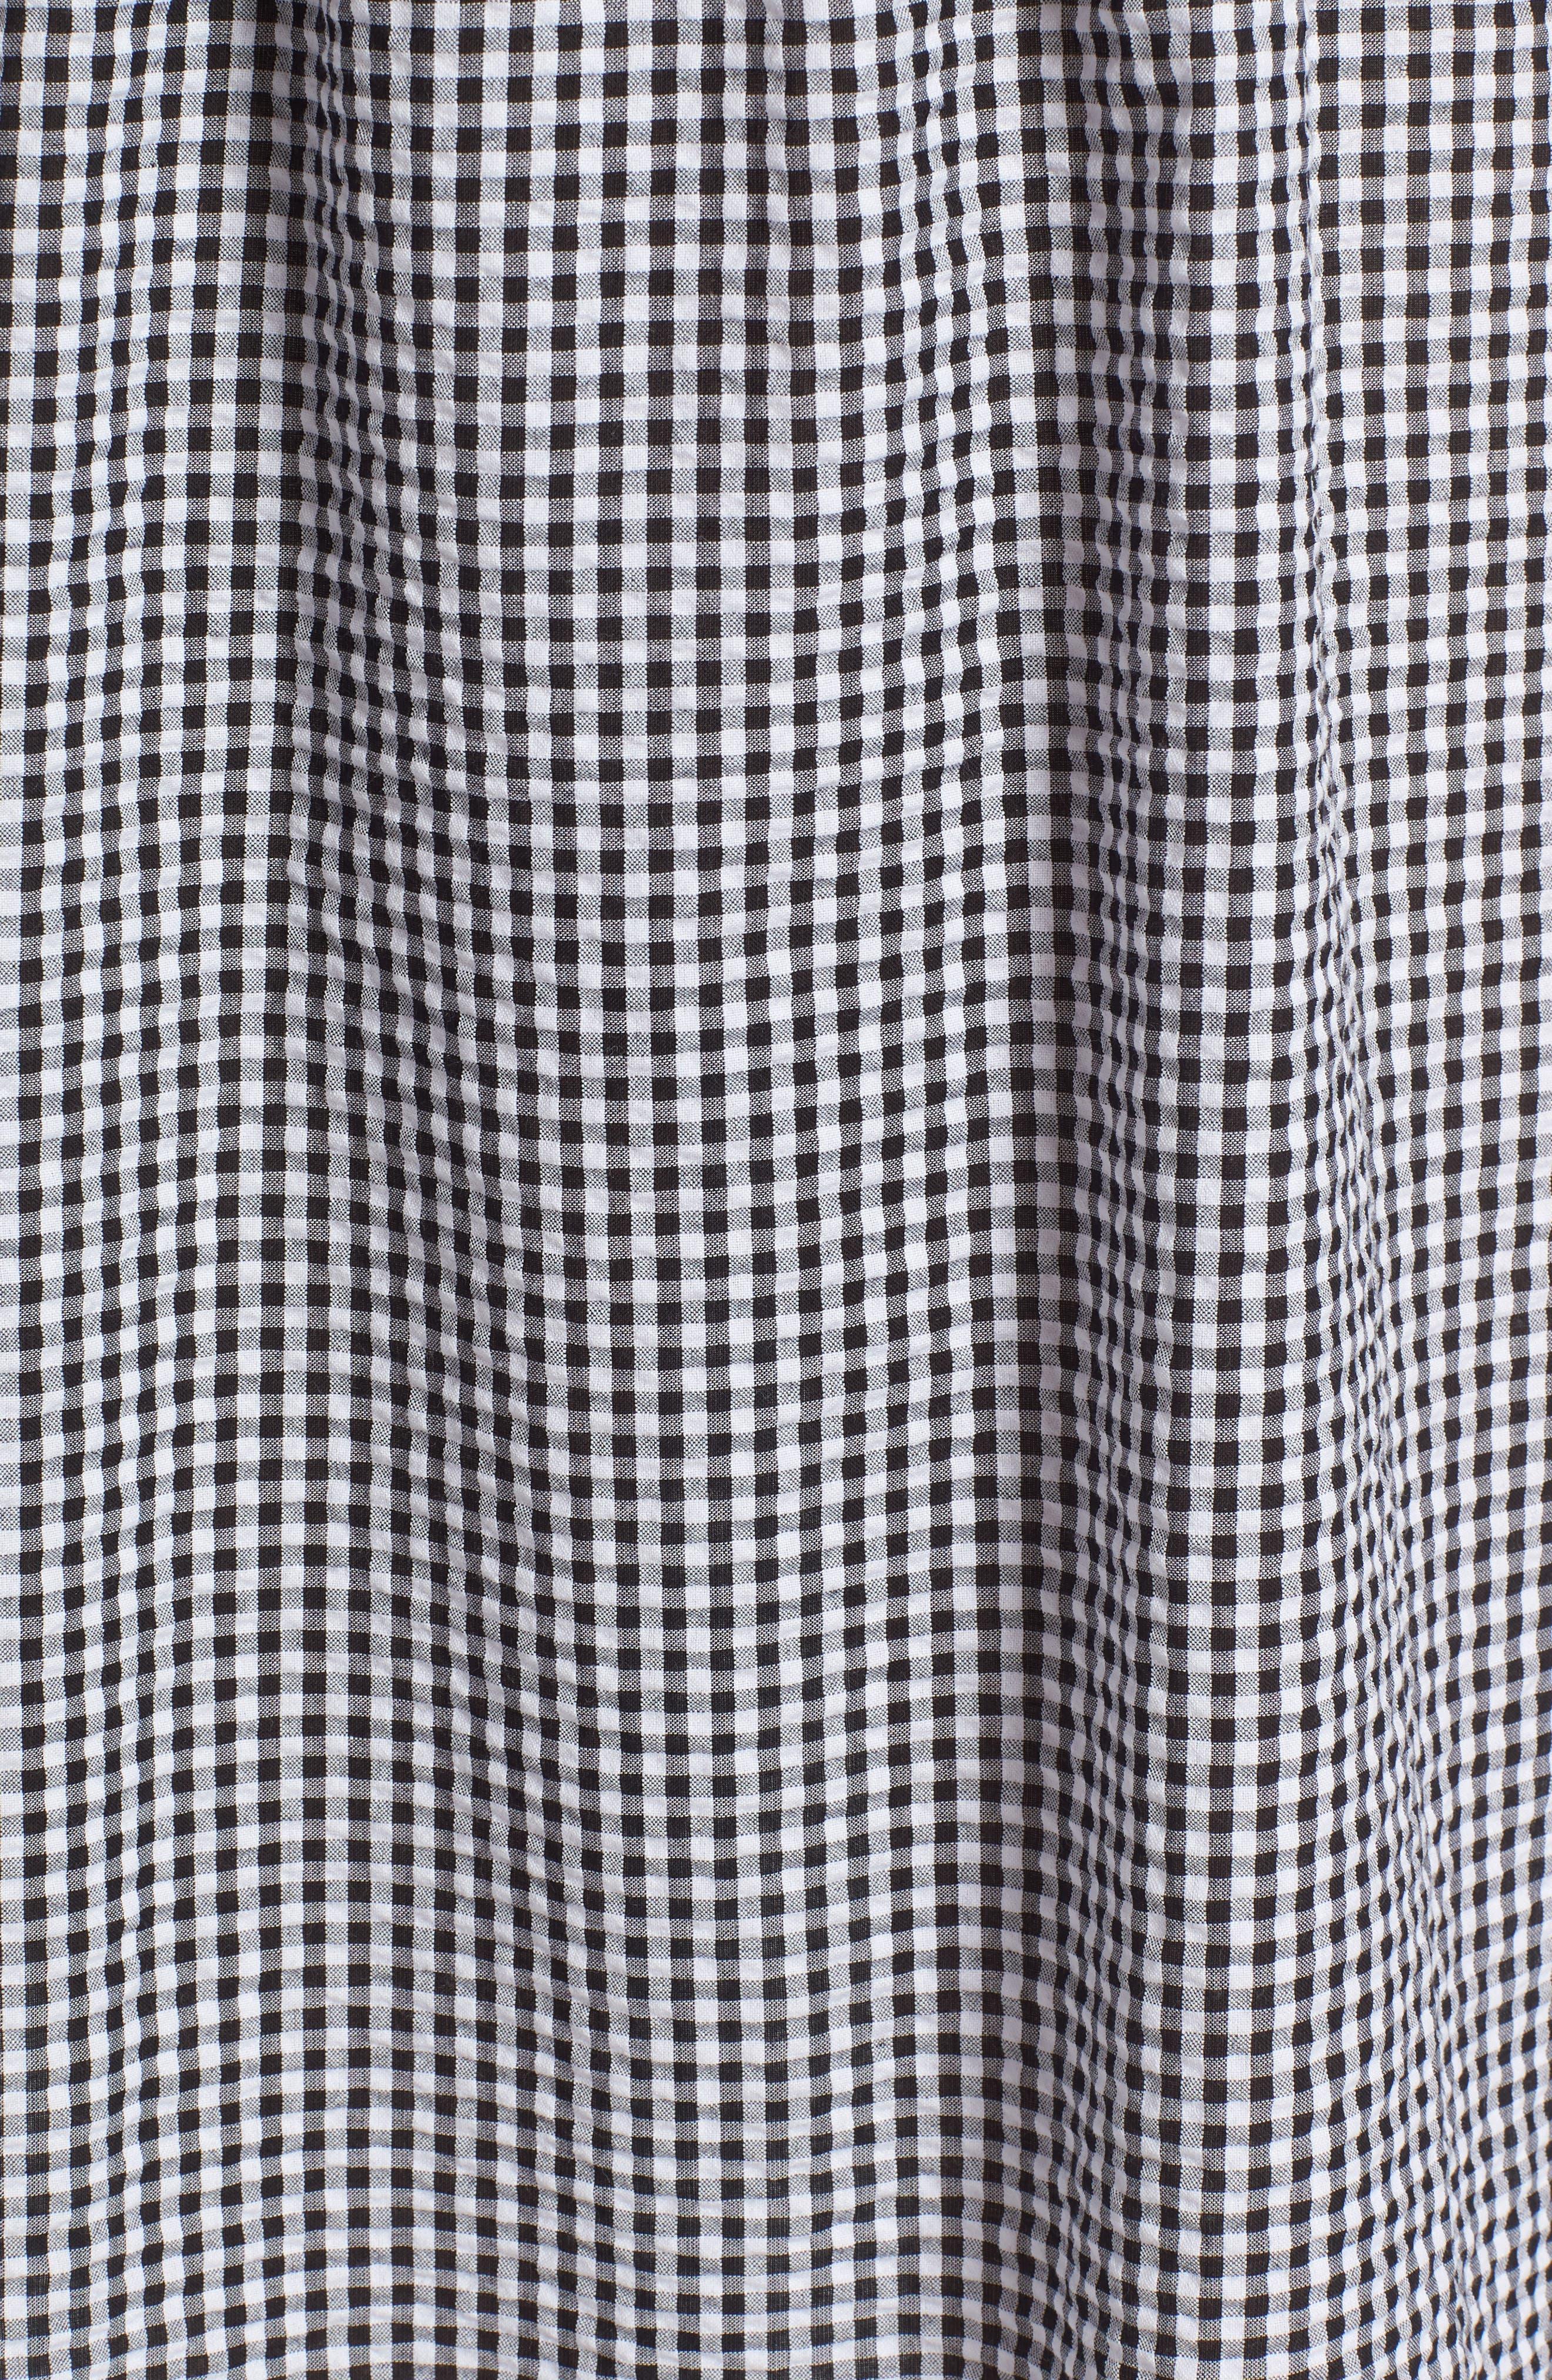 Gingham Off the Shoulder Dress,                             Alternate thumbnail 6, color,                             Black White Gingham